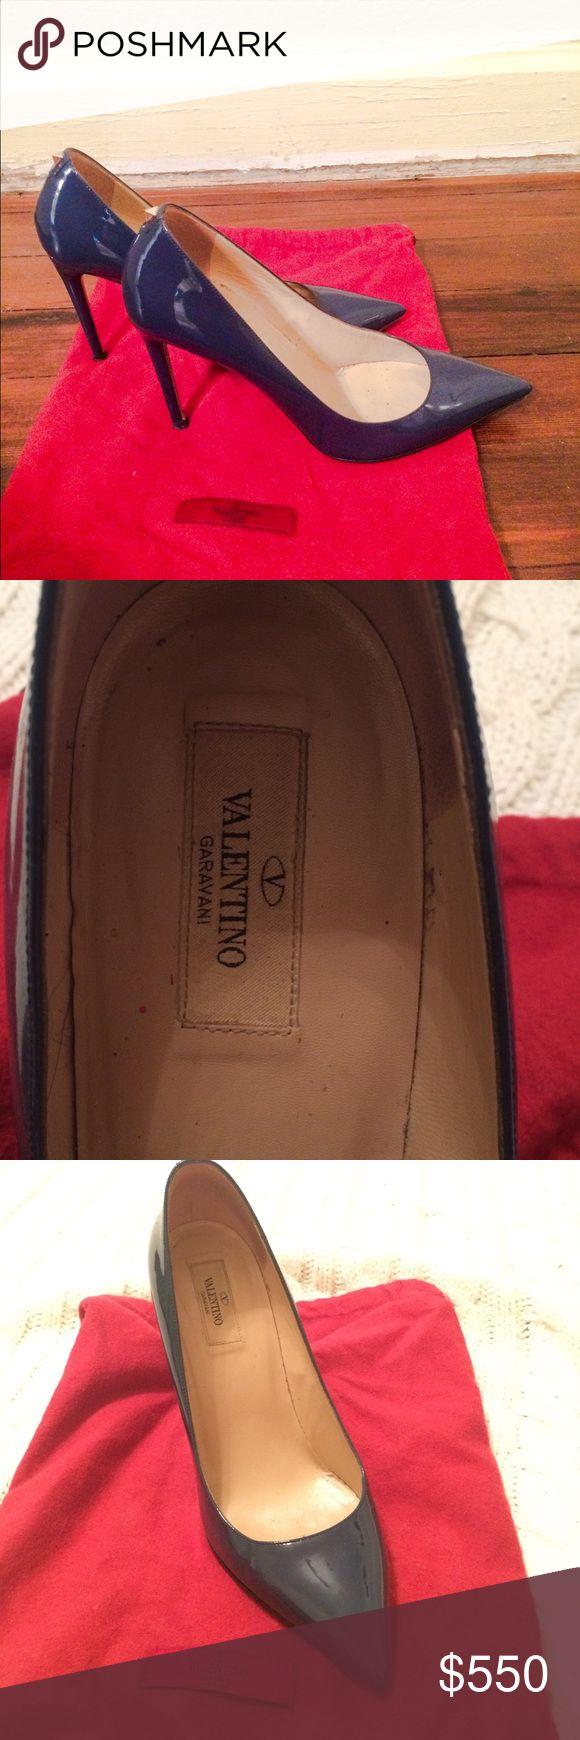 Original Valentino heels Beautiful navy blue heels in very good condition. Original price $800. Valentino Shoes Heels